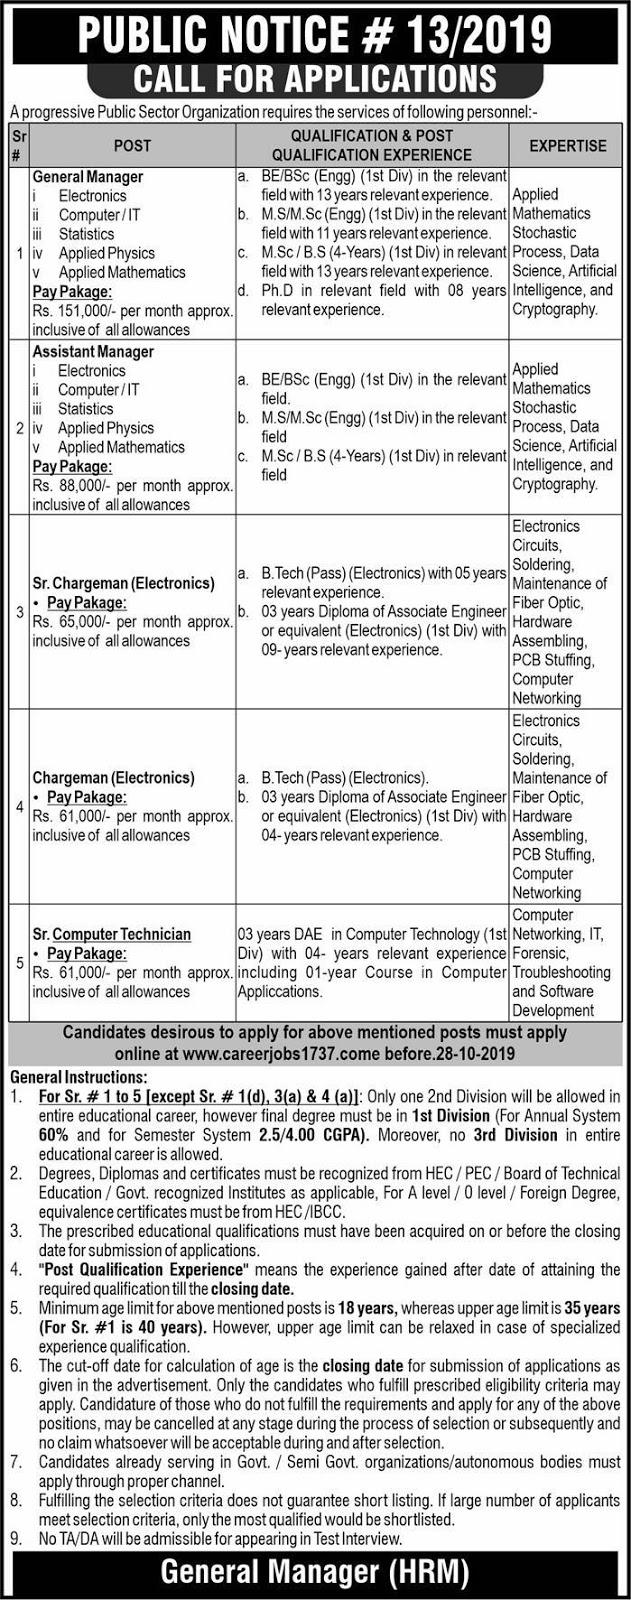 A Progressive Public Sector Organization Career1737 Jobs 2019 – Atomic Energy Commission